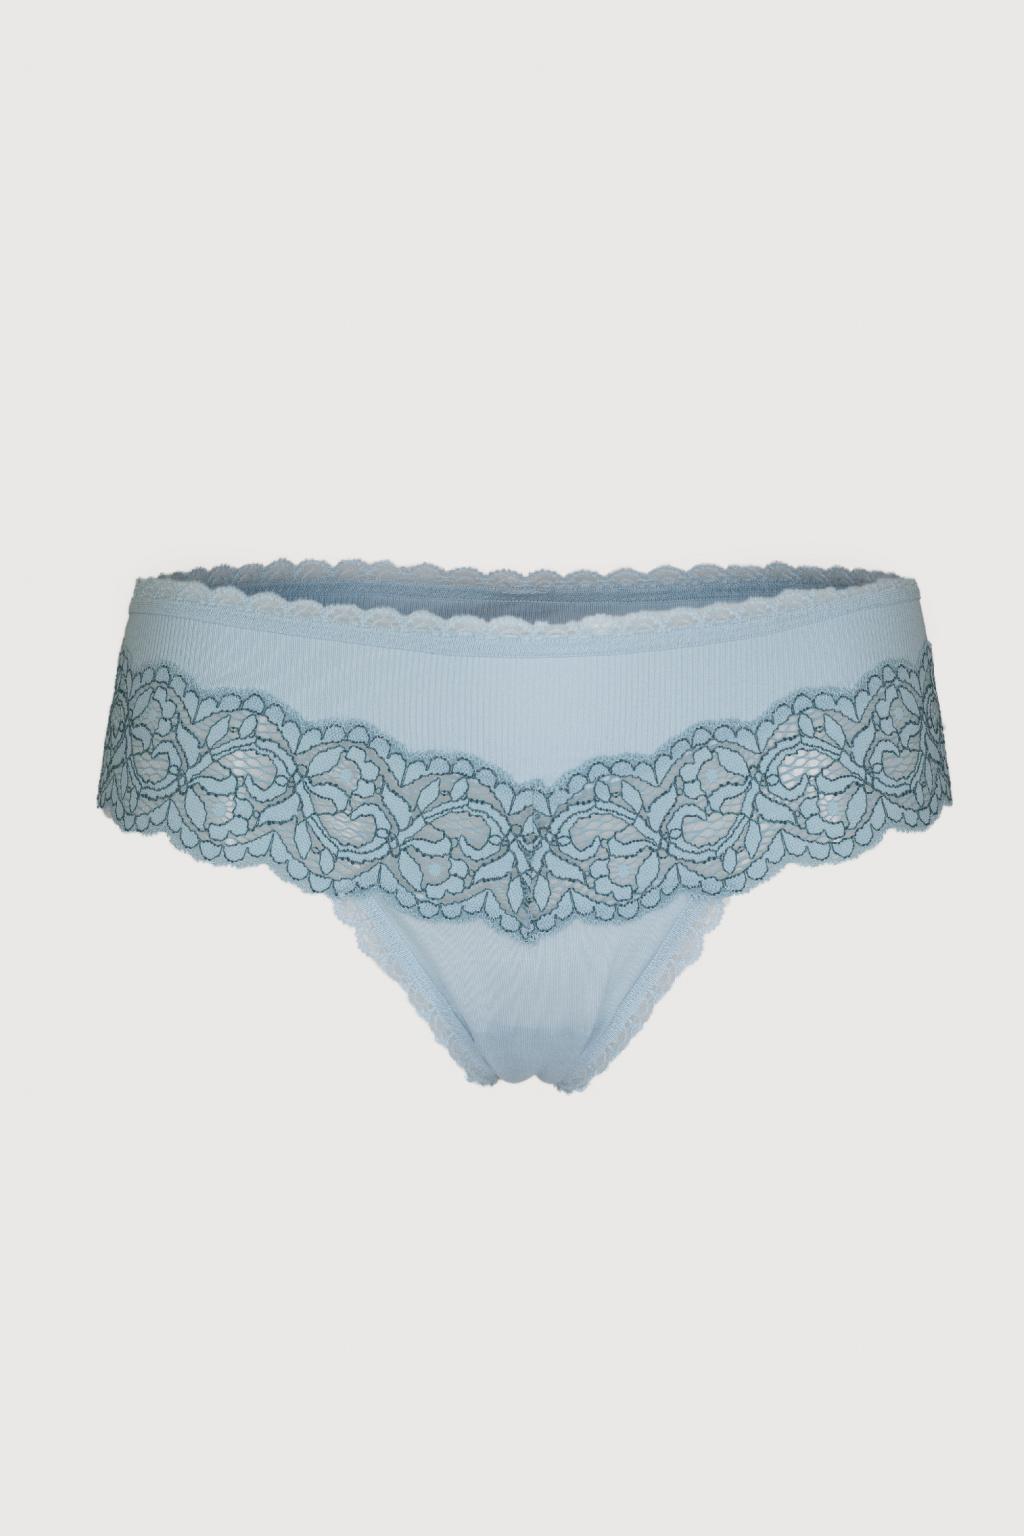 Luxusní tanga kalhotky Victoria's Secret – lolita blue